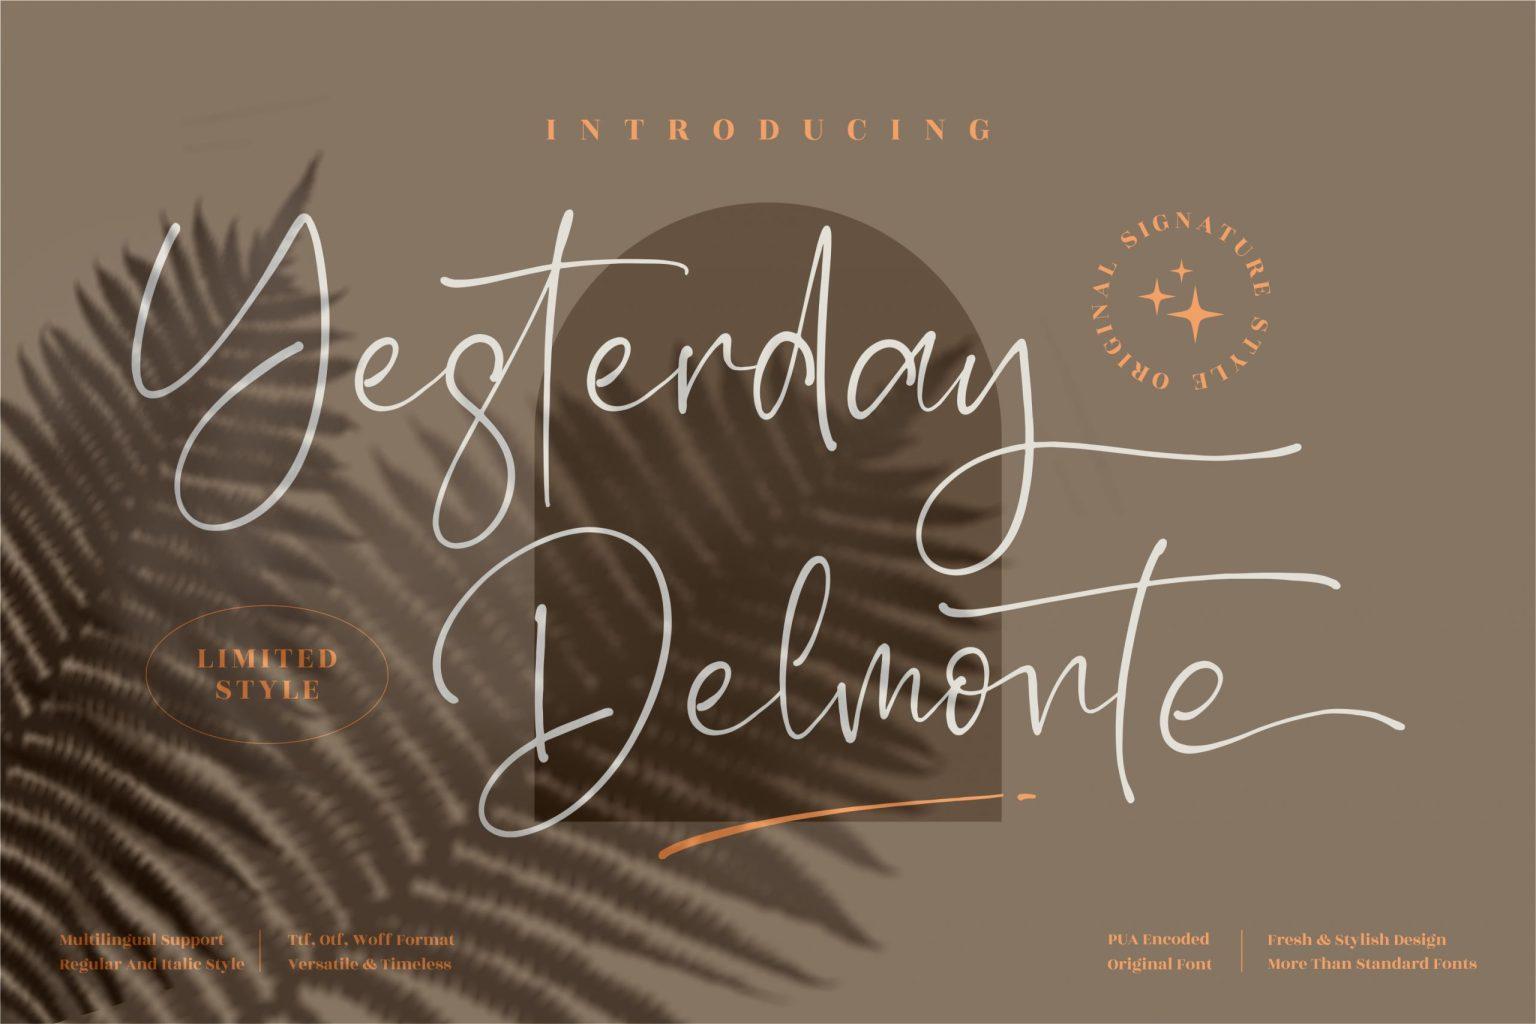 Yesterday Delmonte Font